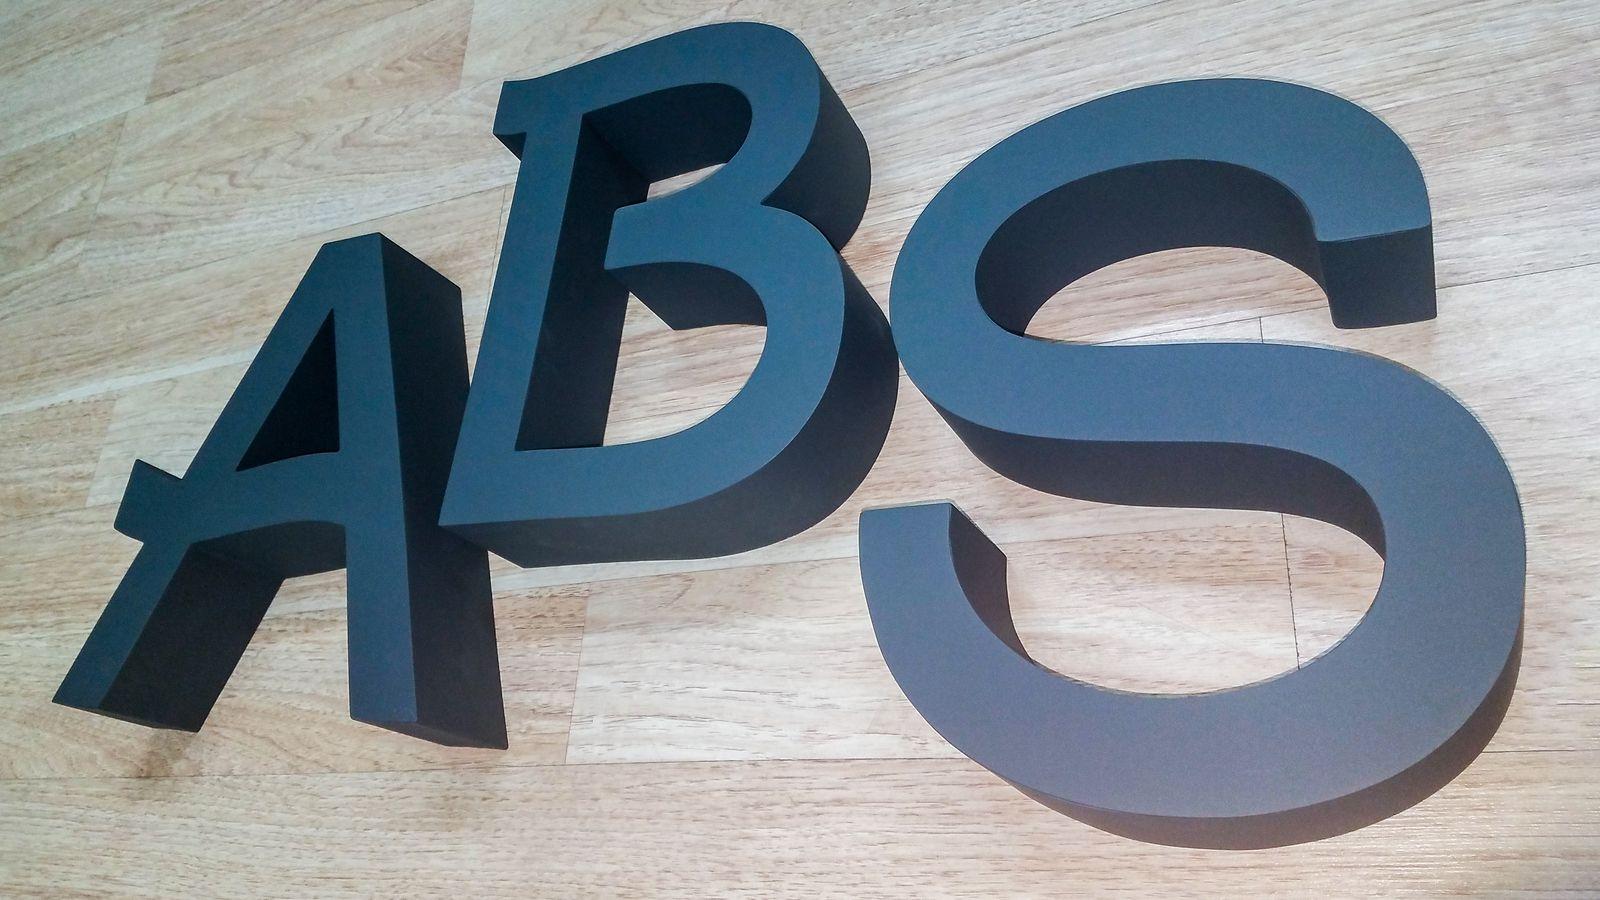 ABS Aluminum letters